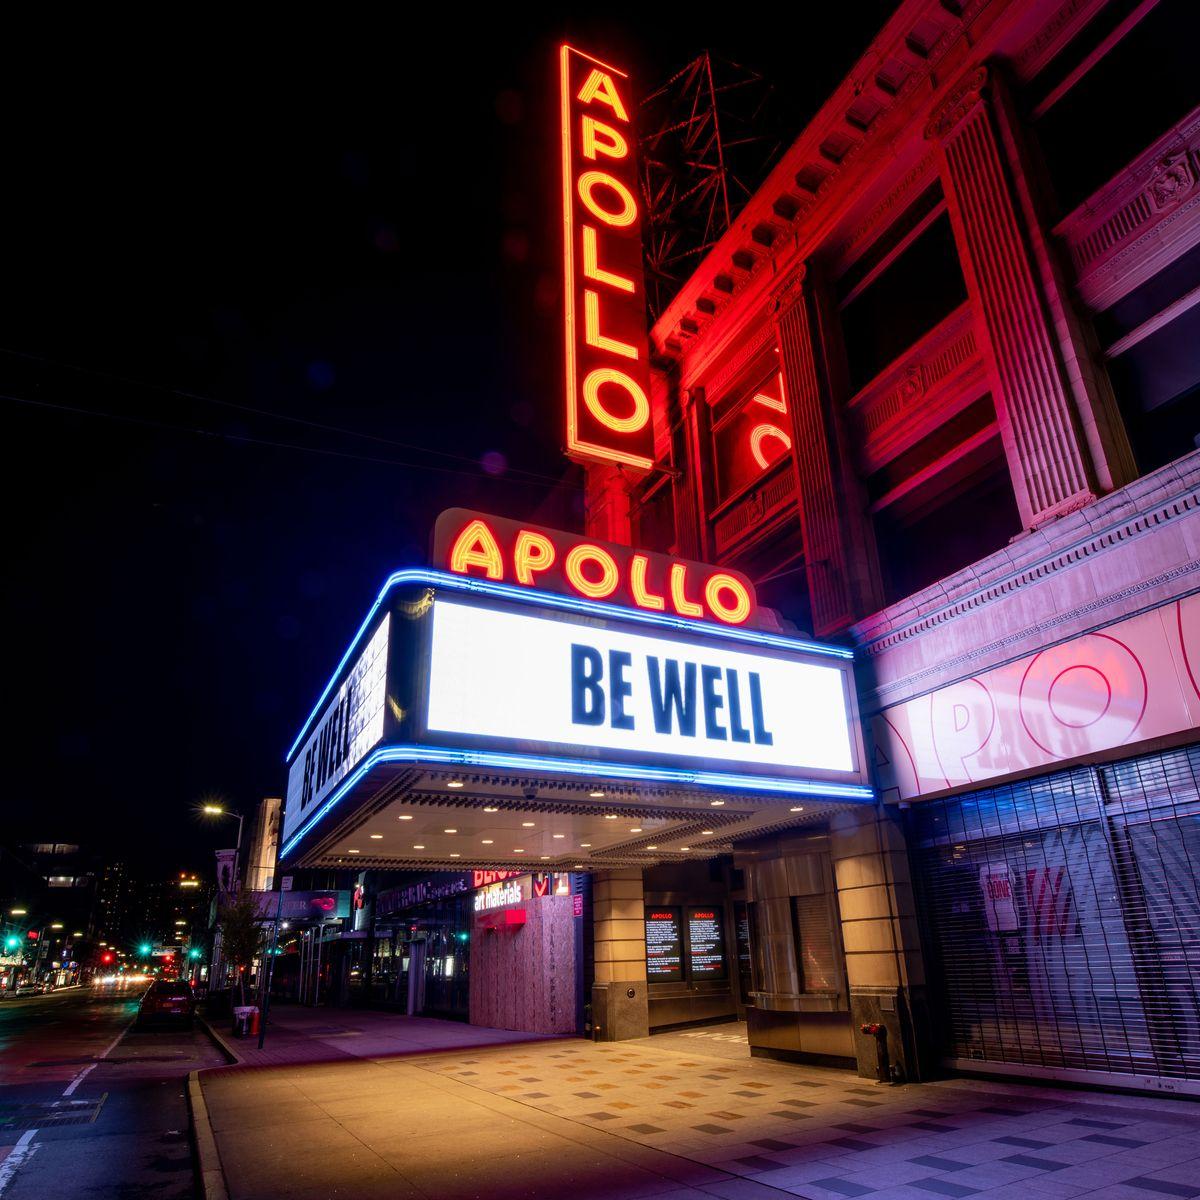 How the Apollo Theater Is Responding to Coronavirus Closure